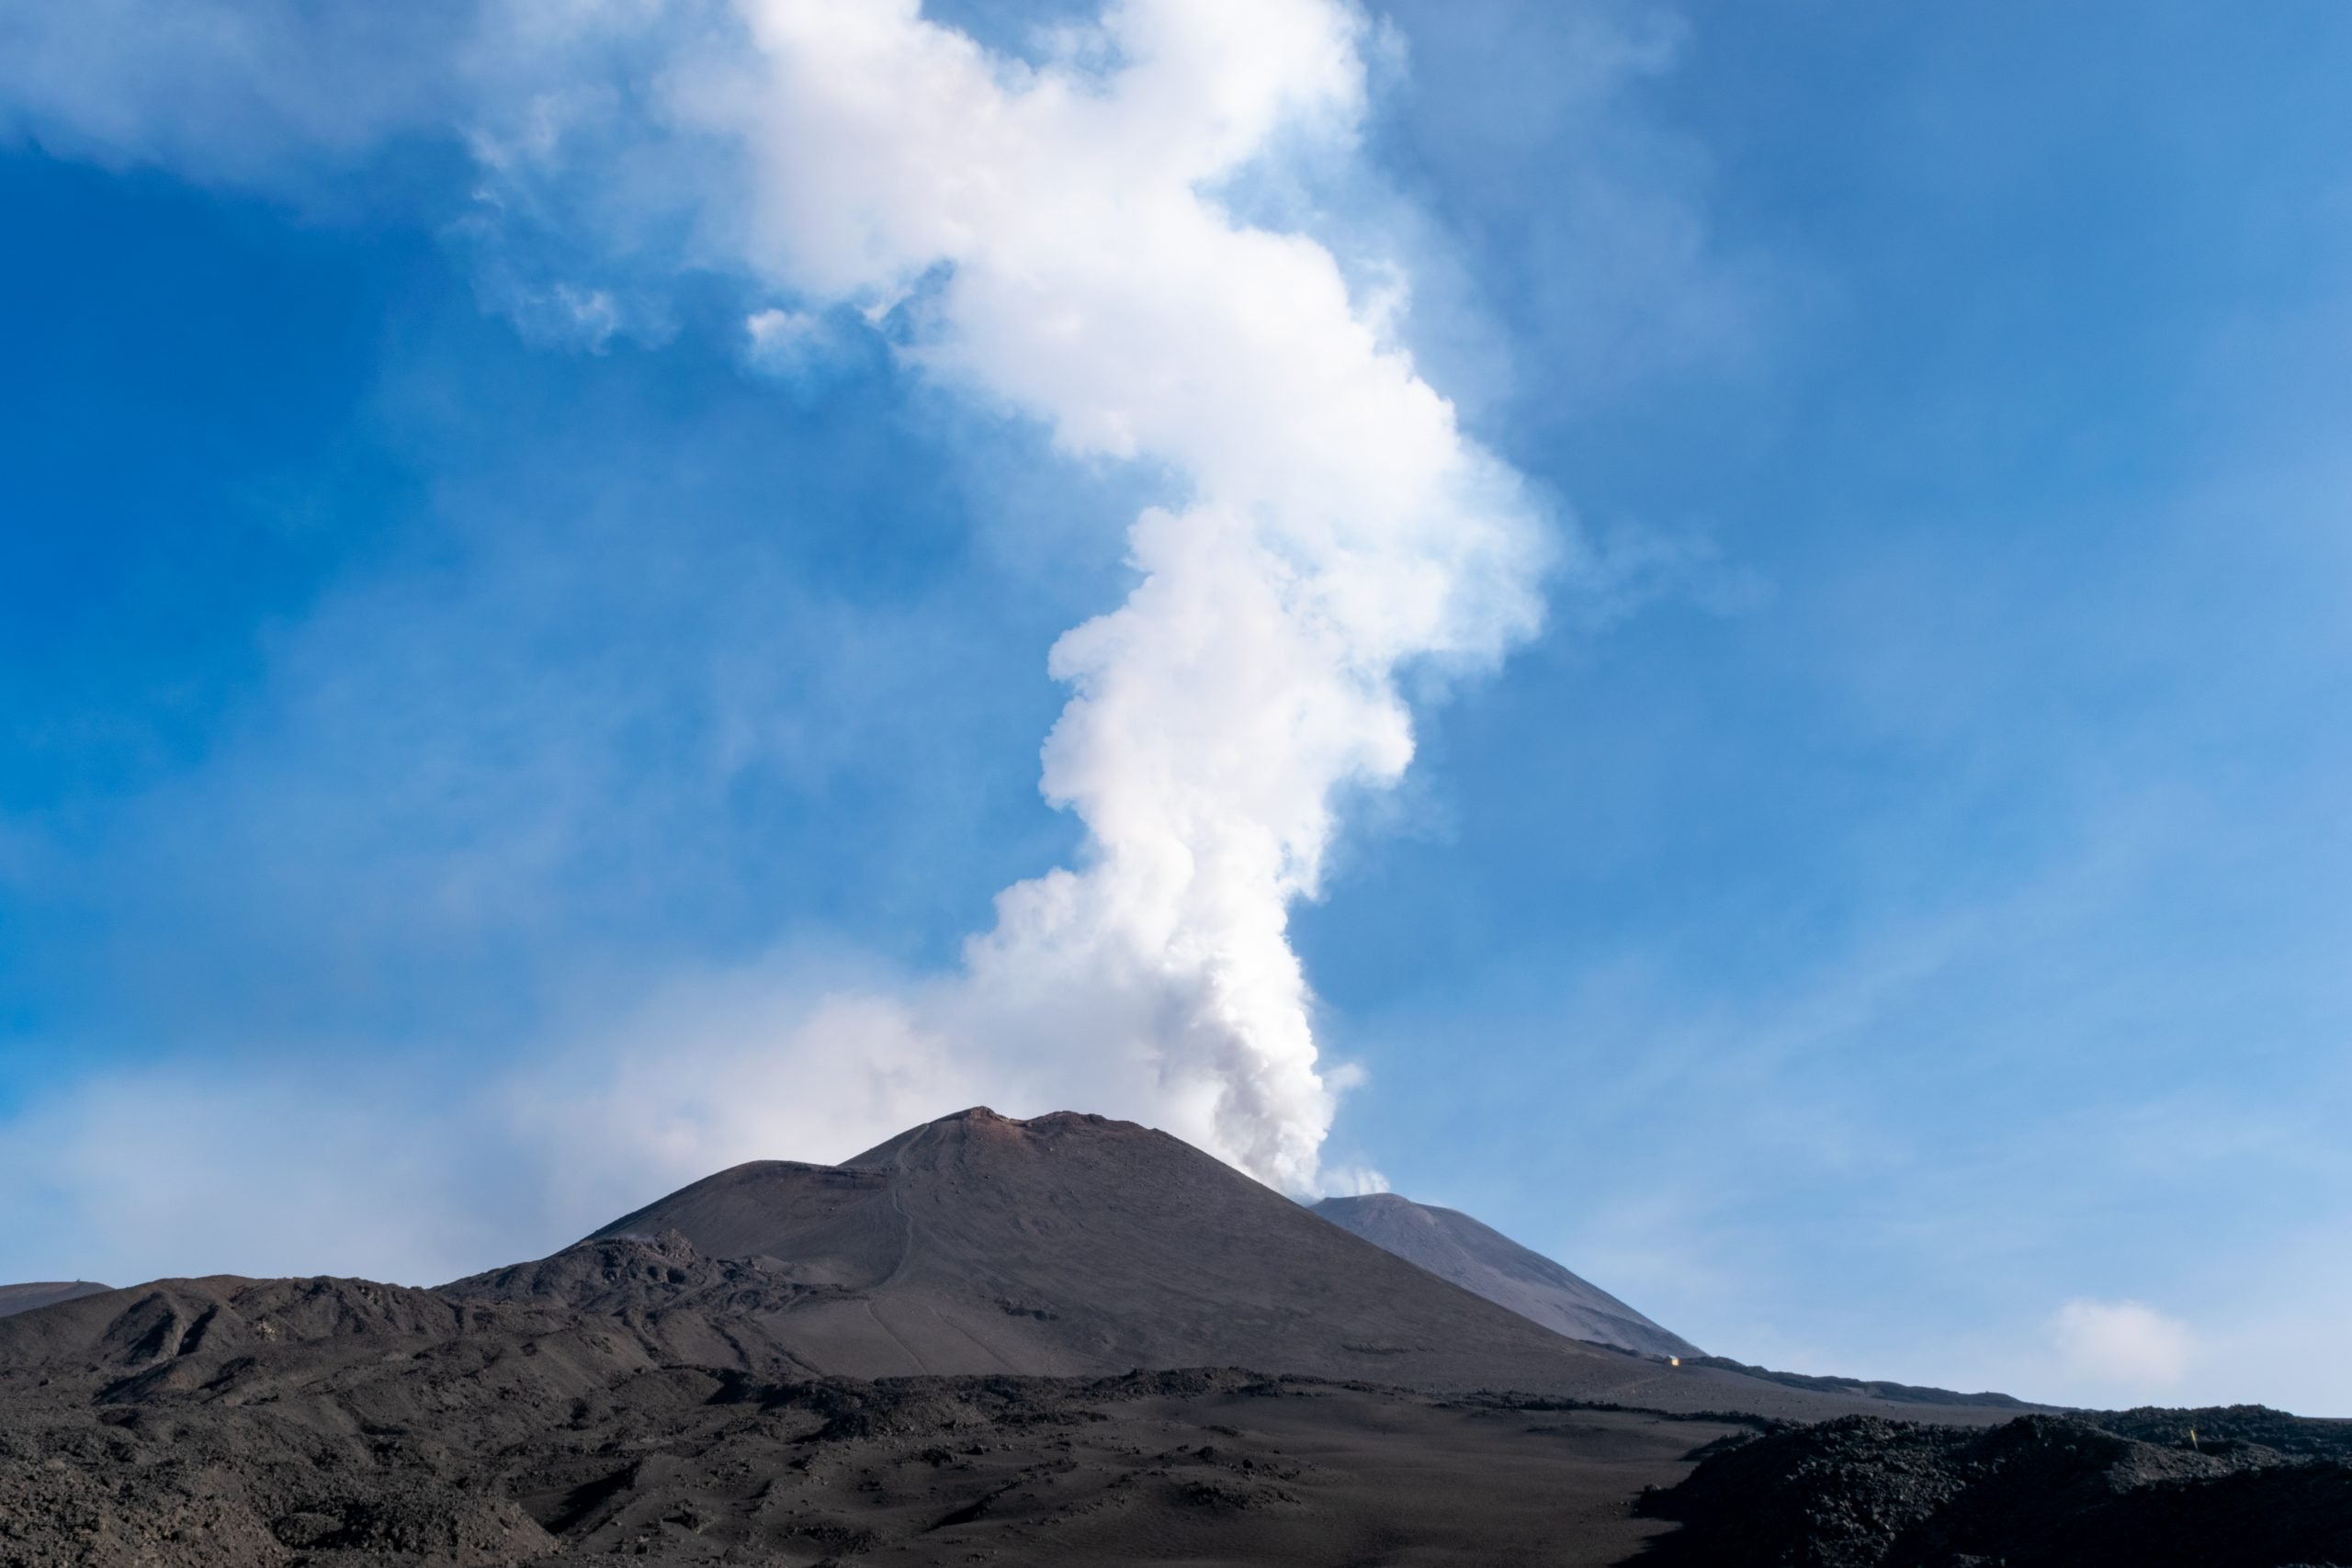 Quattro giorni sull'Etna, la nostra Grande Traversata Etnea